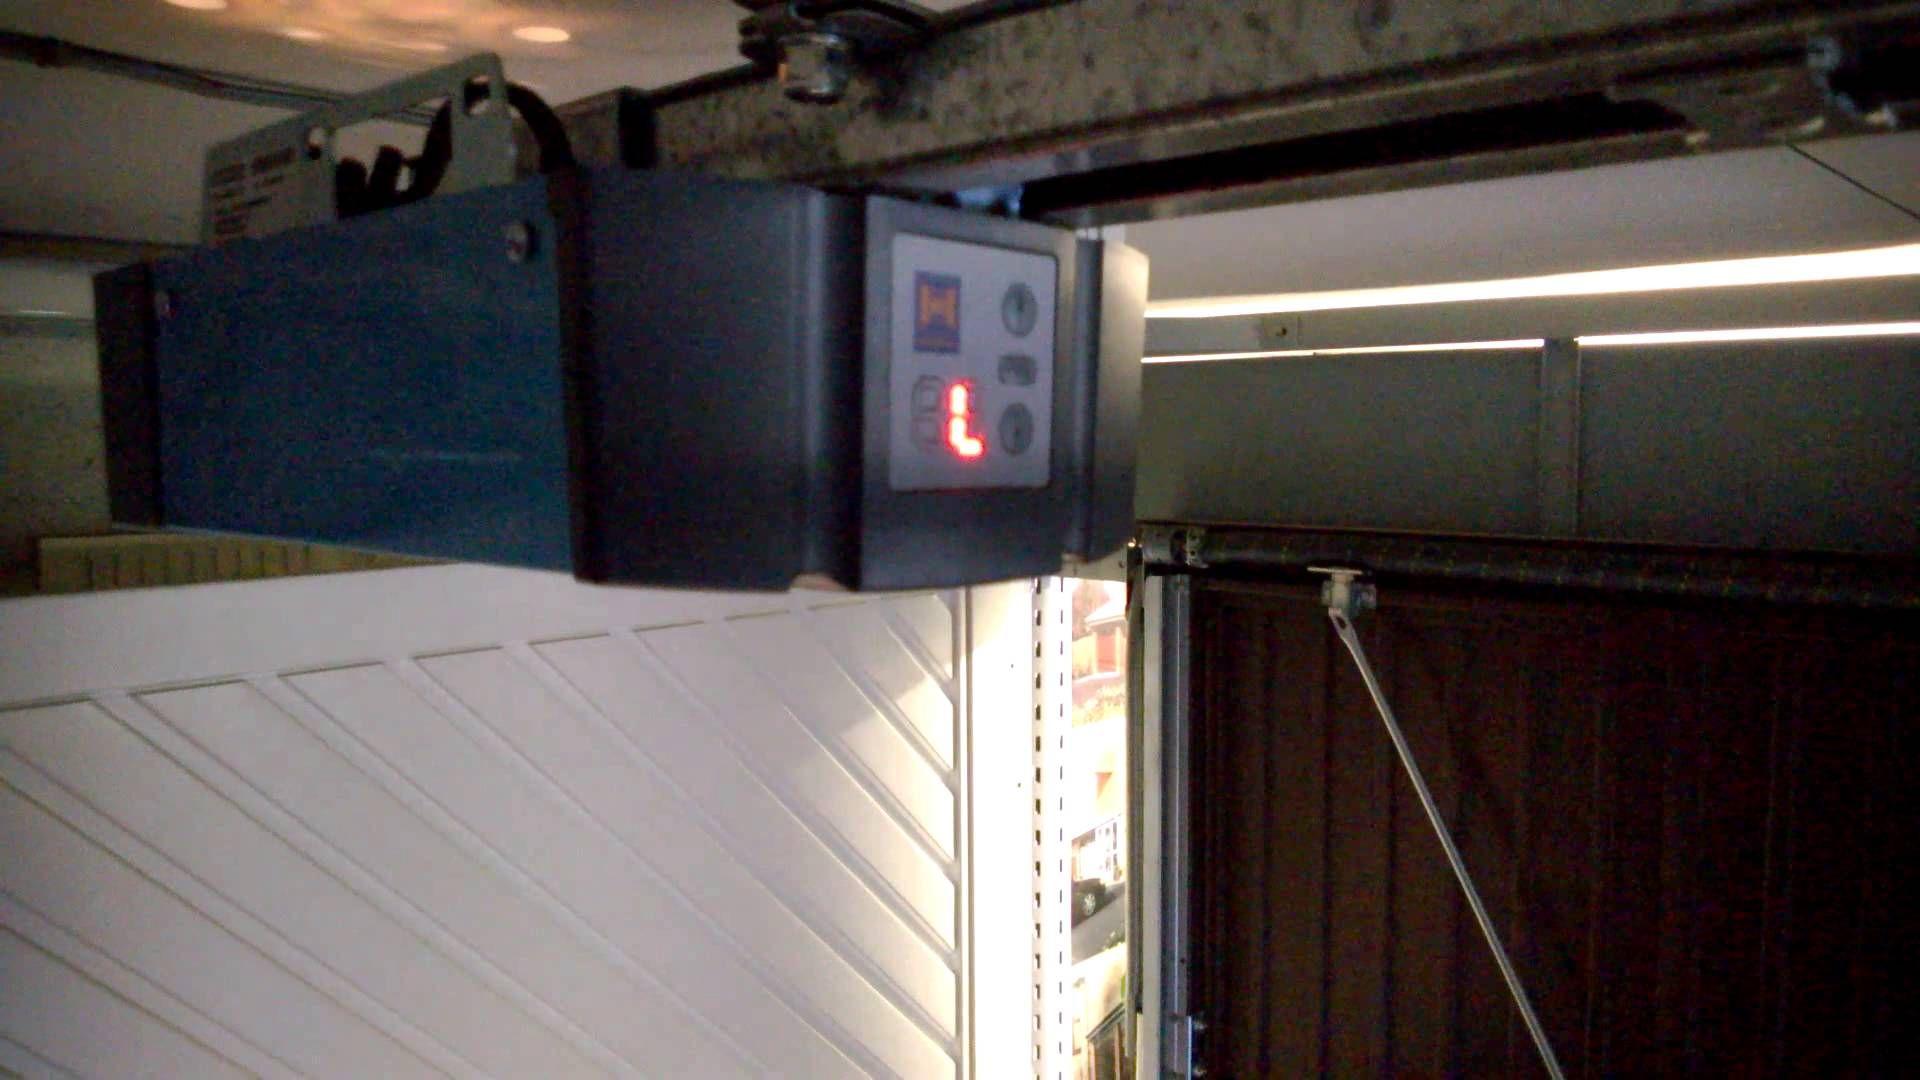 Resetting The Hormann Bisecur Supramatic Hormann Garage Doors Garage Doors Reset